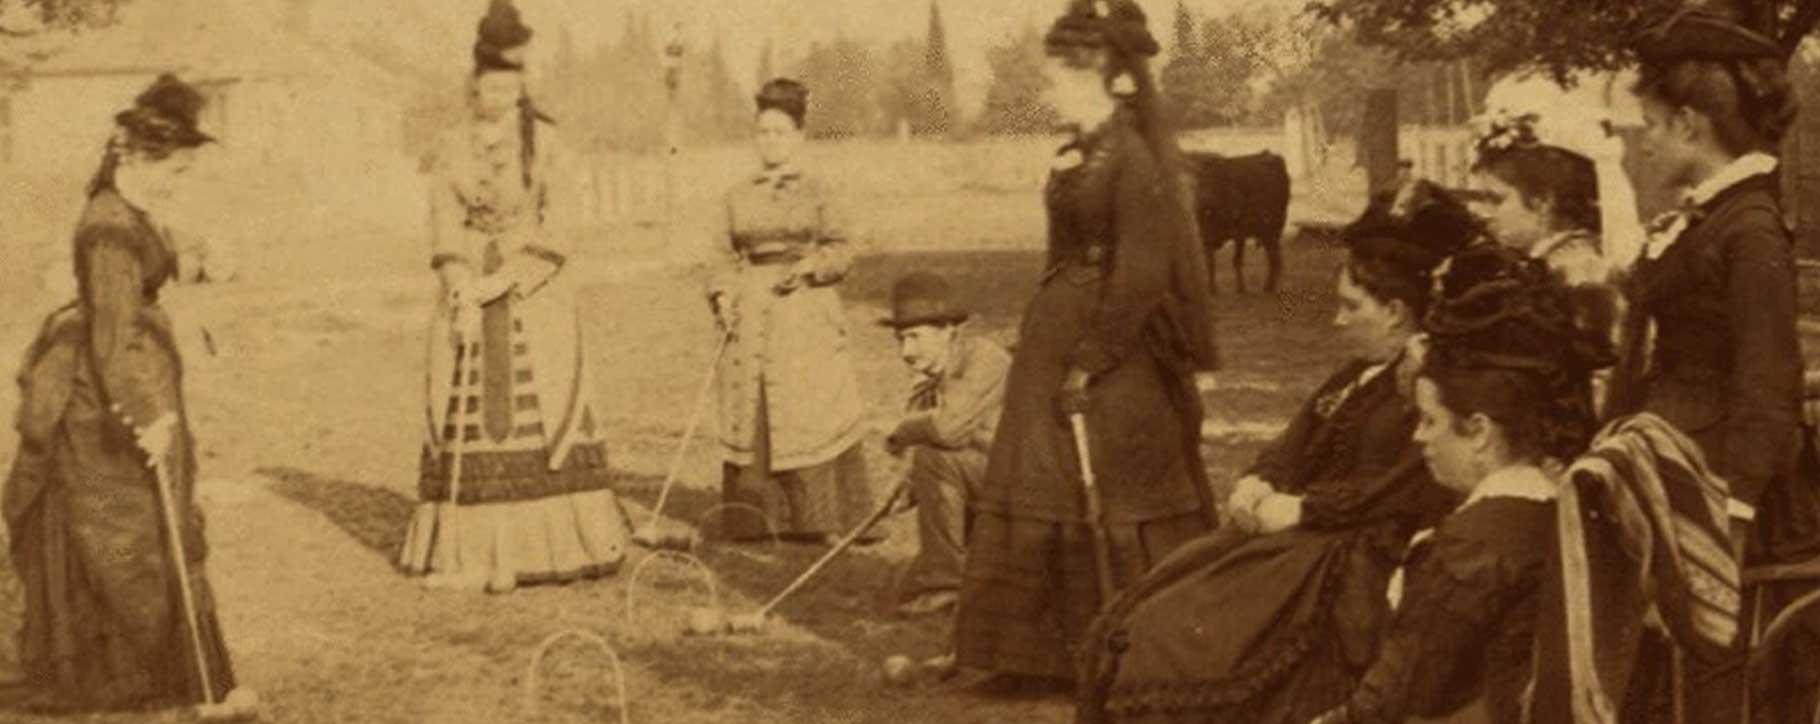 victorian croquet - wooden games